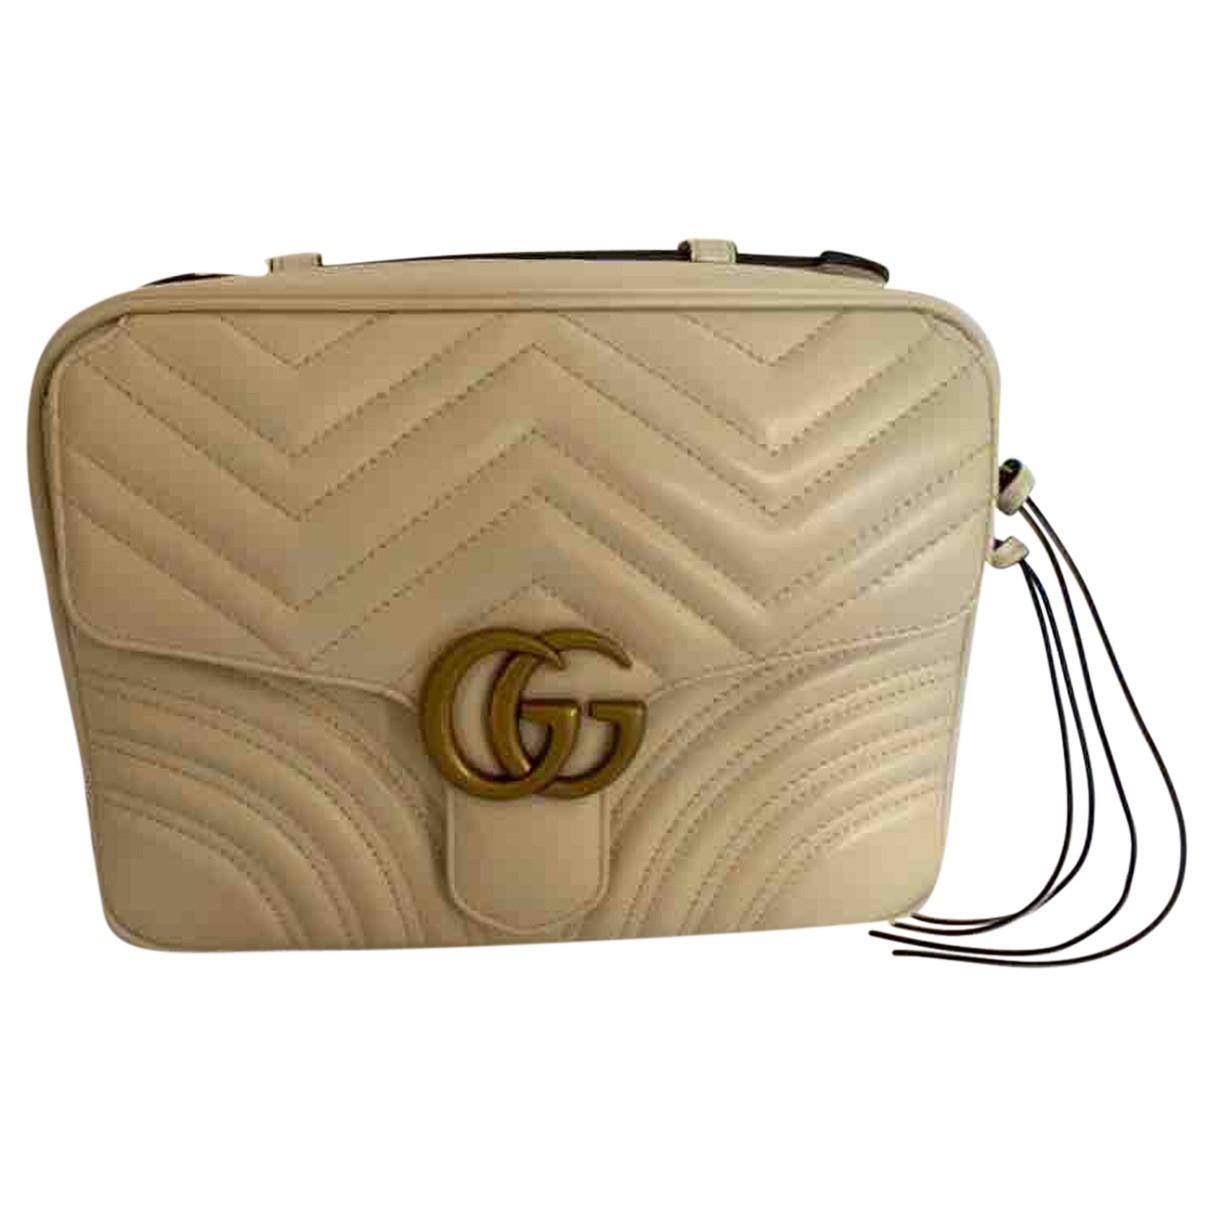 Gucci - Sac a main Marmont pour femme en cuir - blanc